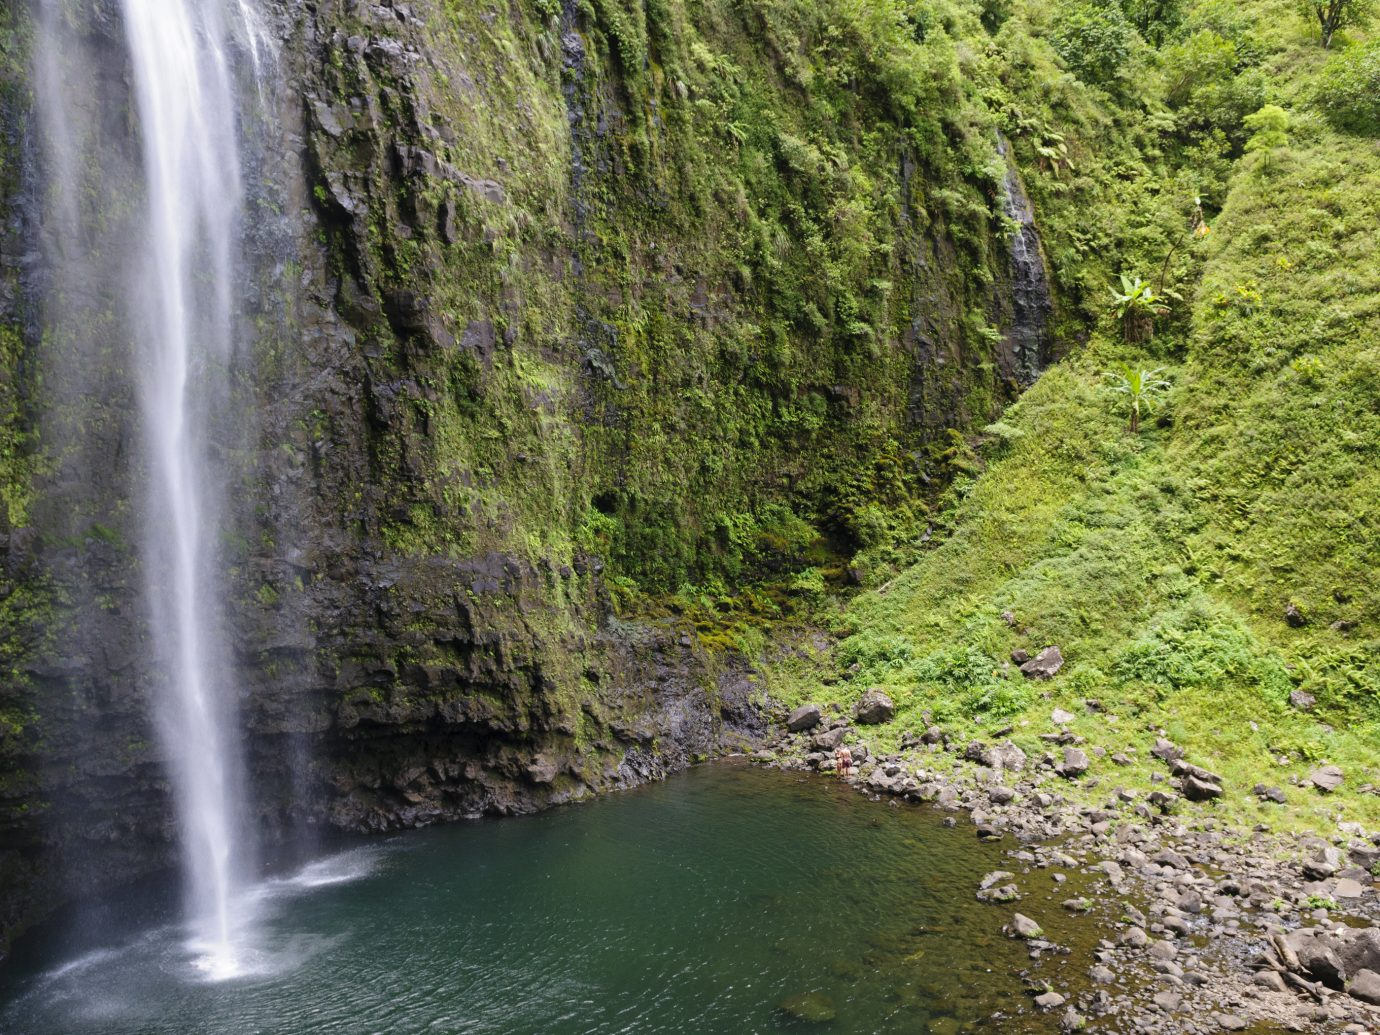 Travel Tips Trip Ideas Nature outdoor Waterfall water tree body of water vegetation watercourse water feature River stream wasserfall ravine rainforest